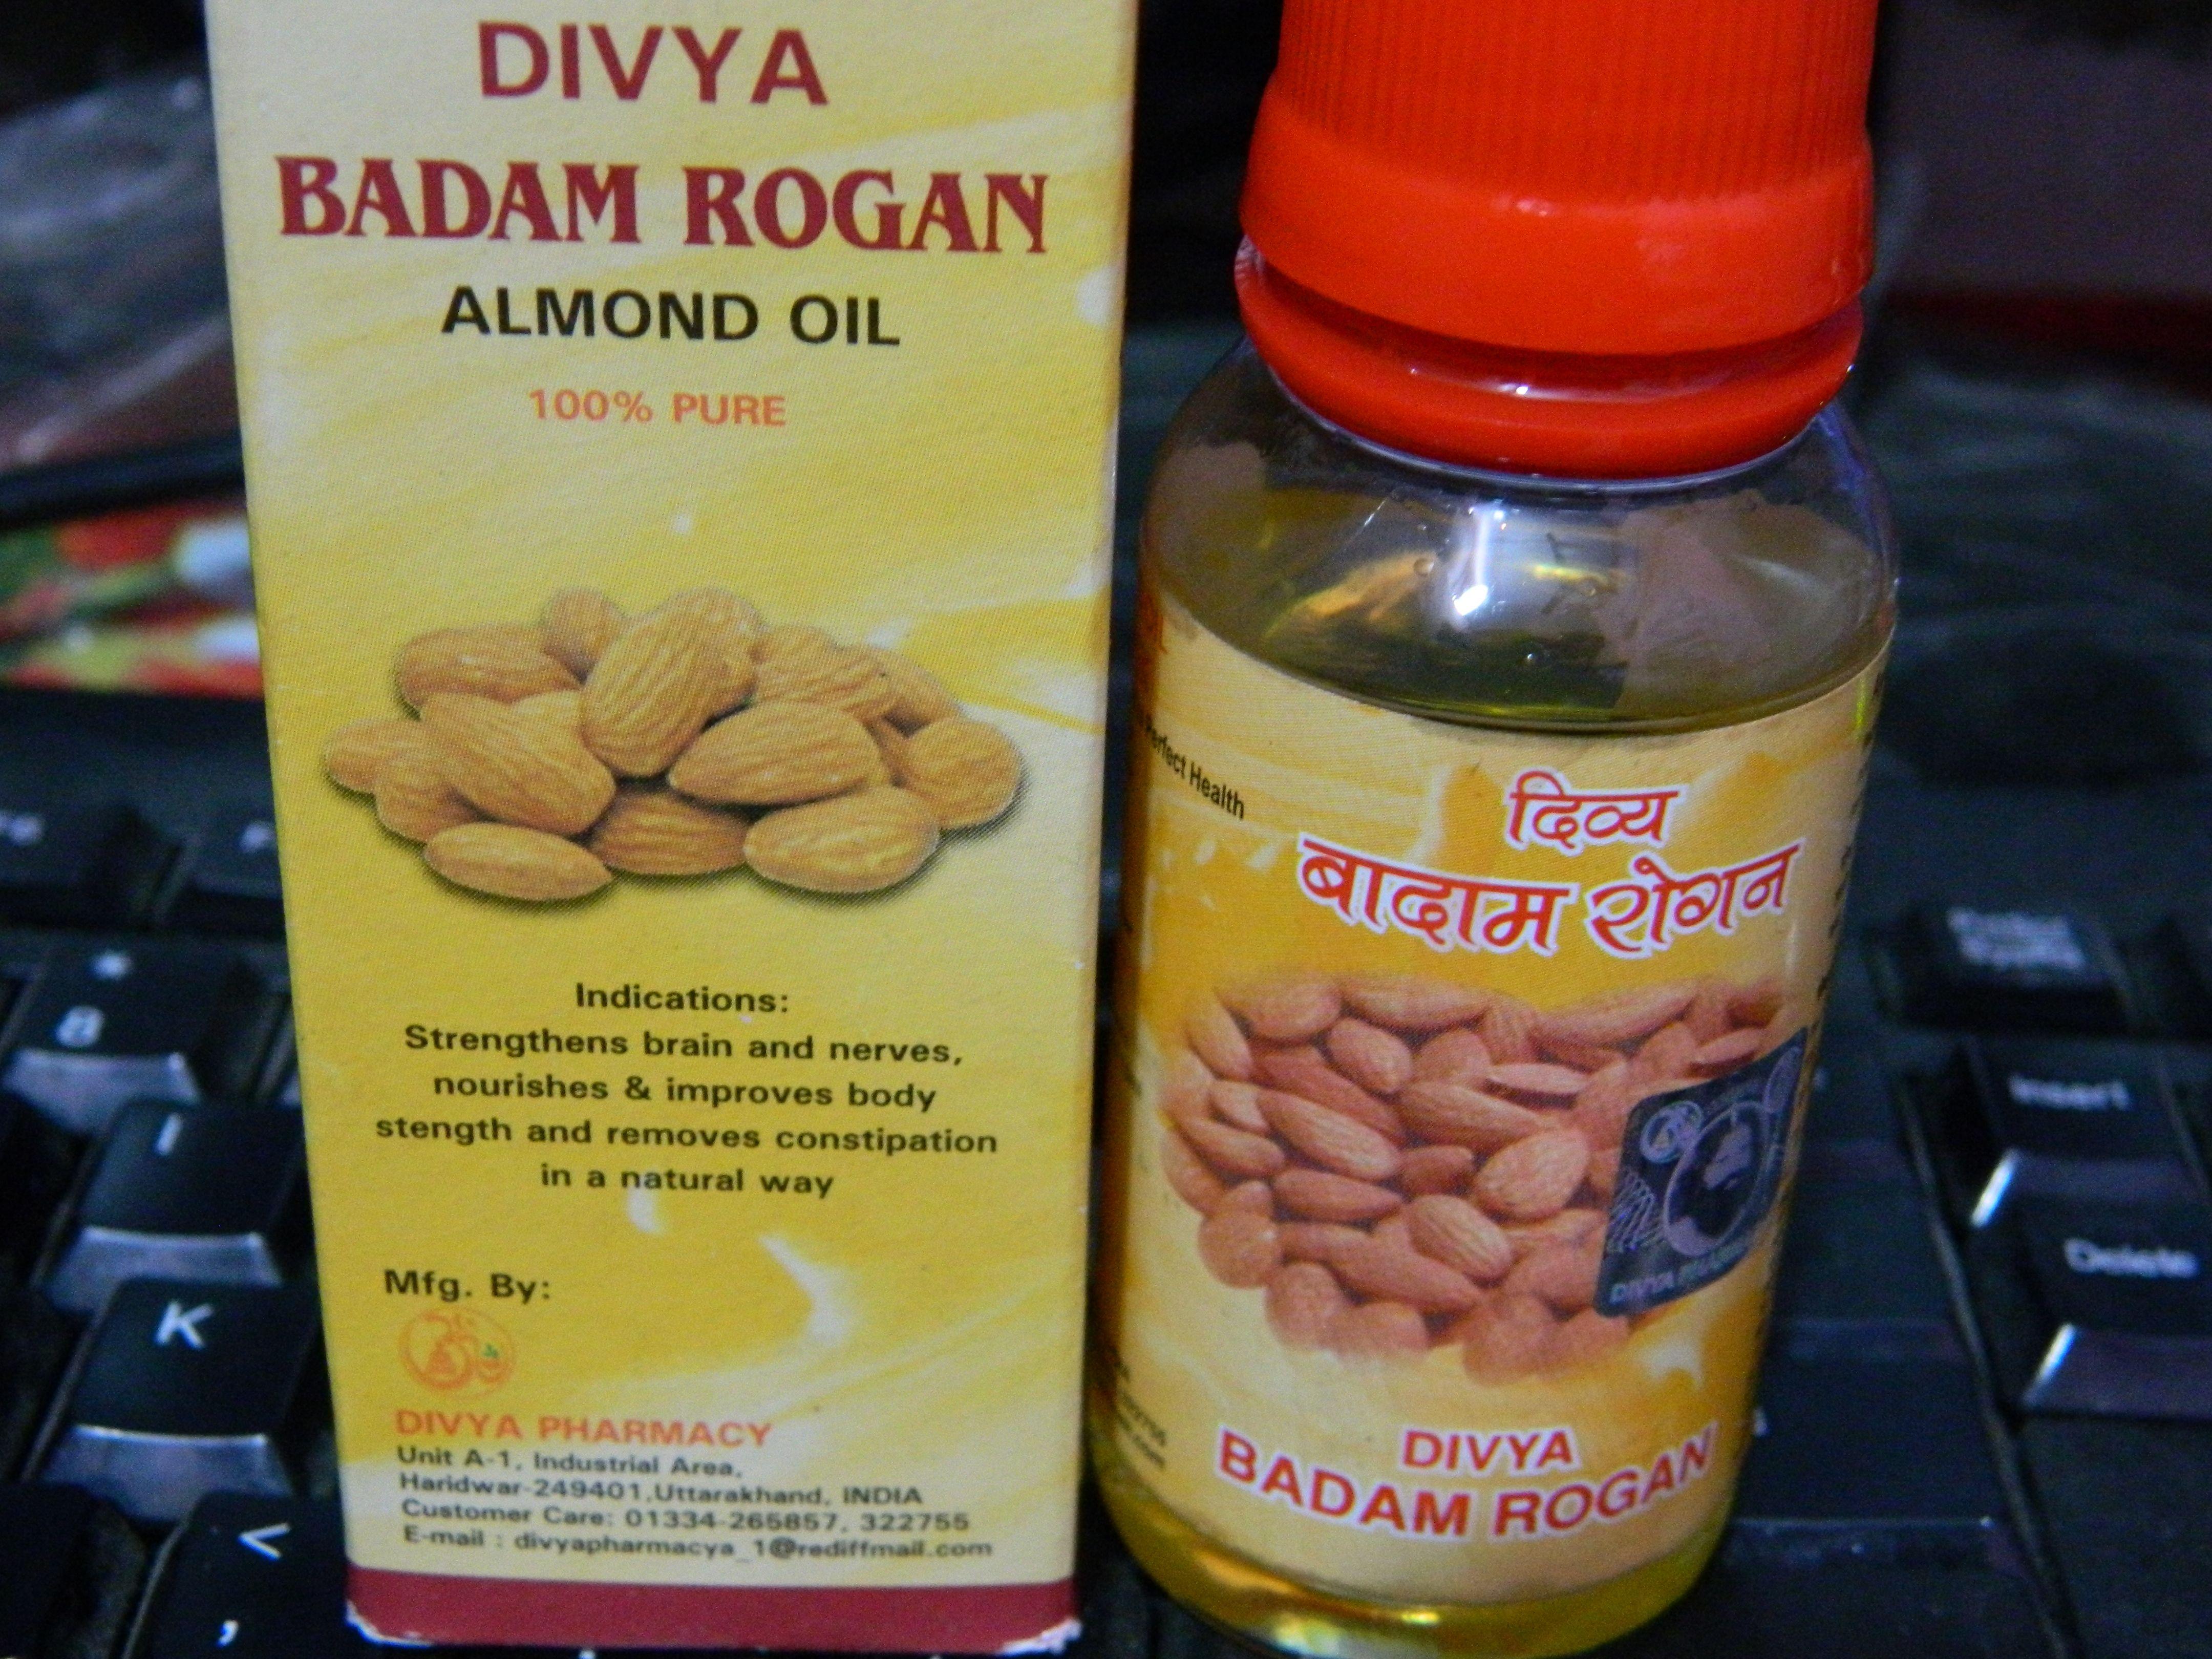 Patanjali Divya Badam Rogan Almond Oil Review Almond Oil Benefits Almond Oil Uses Almond Oil Face